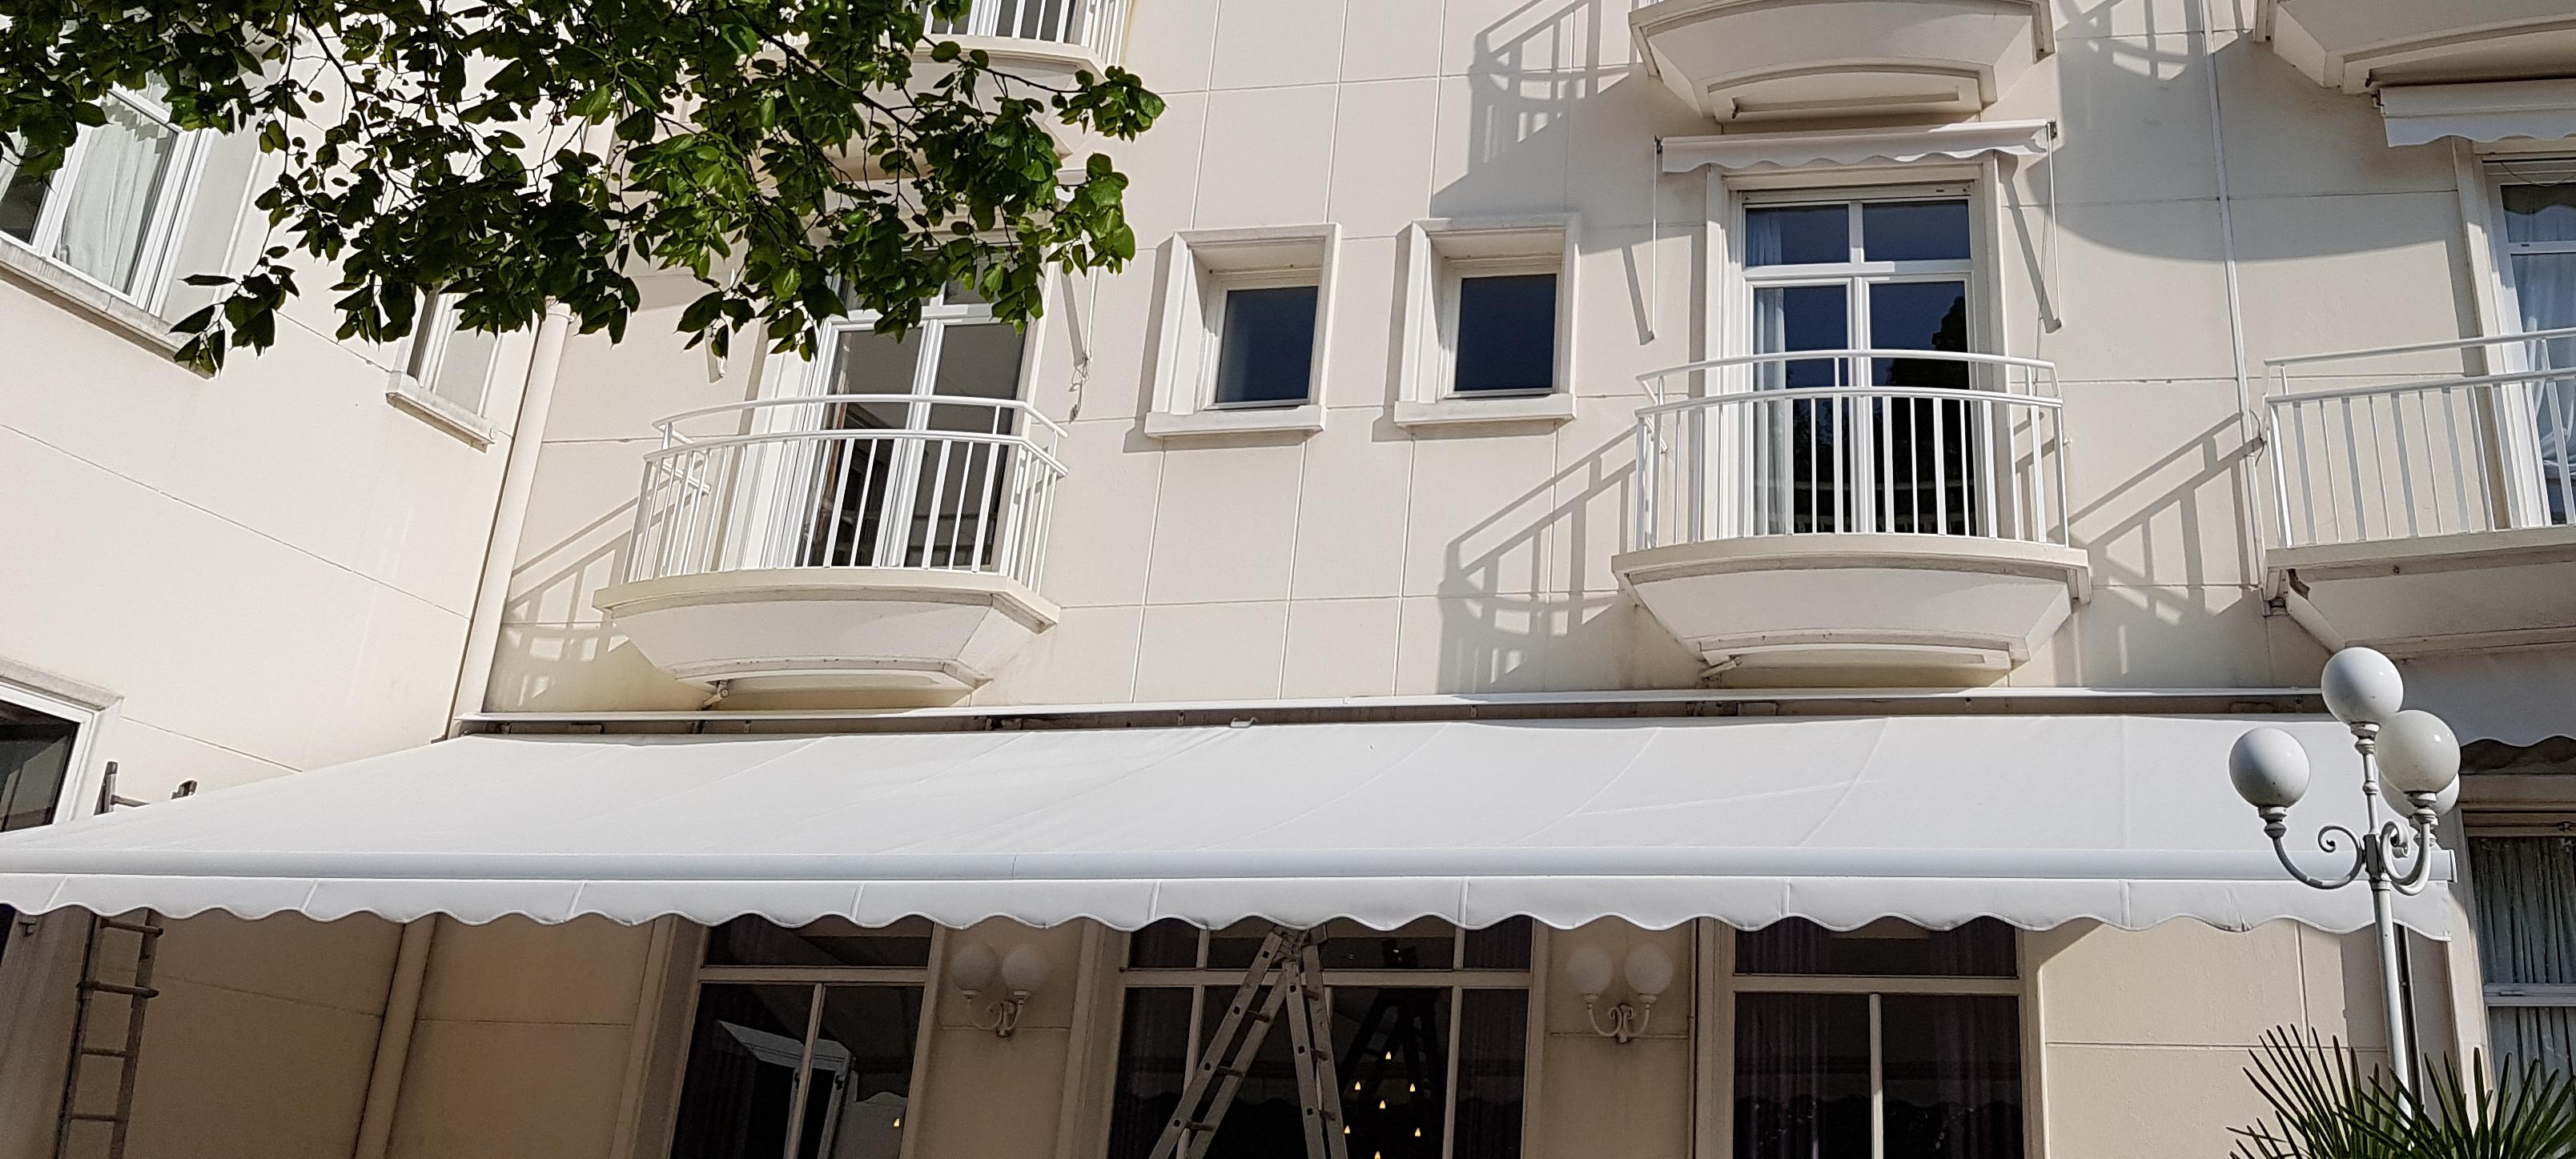 IDS 60 -store grand hotel